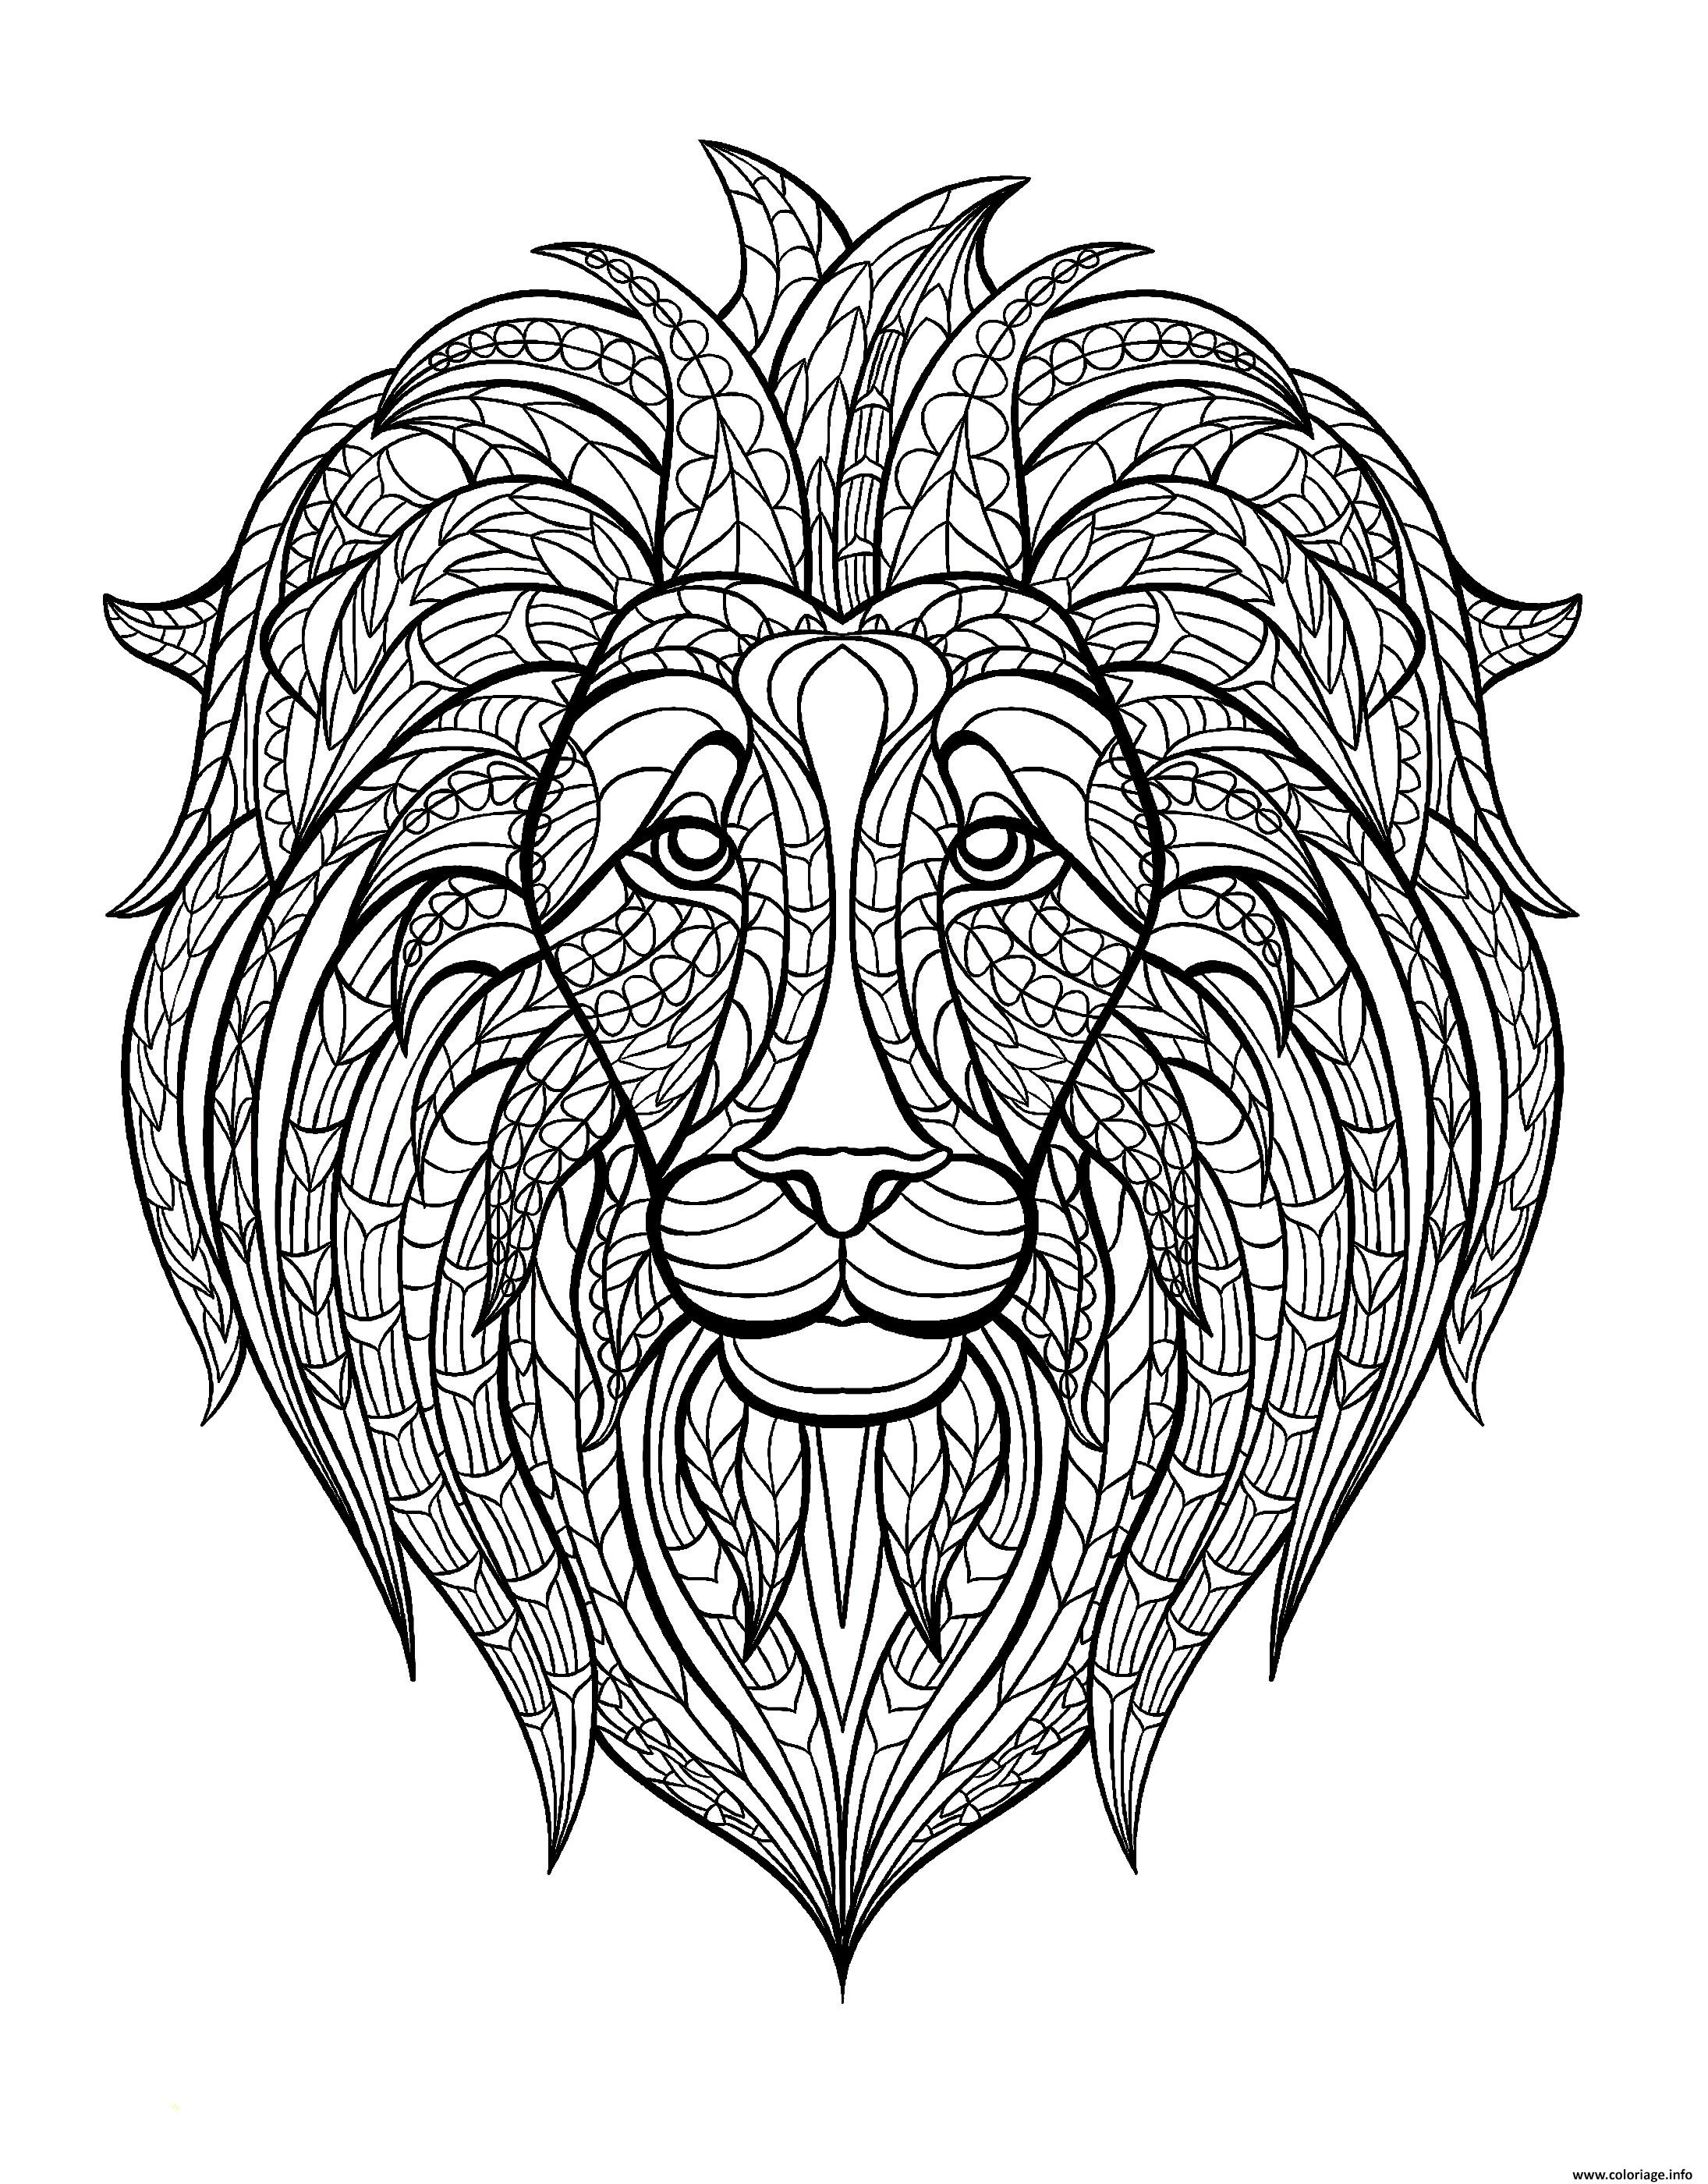 Coloriage Adulte Tete Lion Dessin